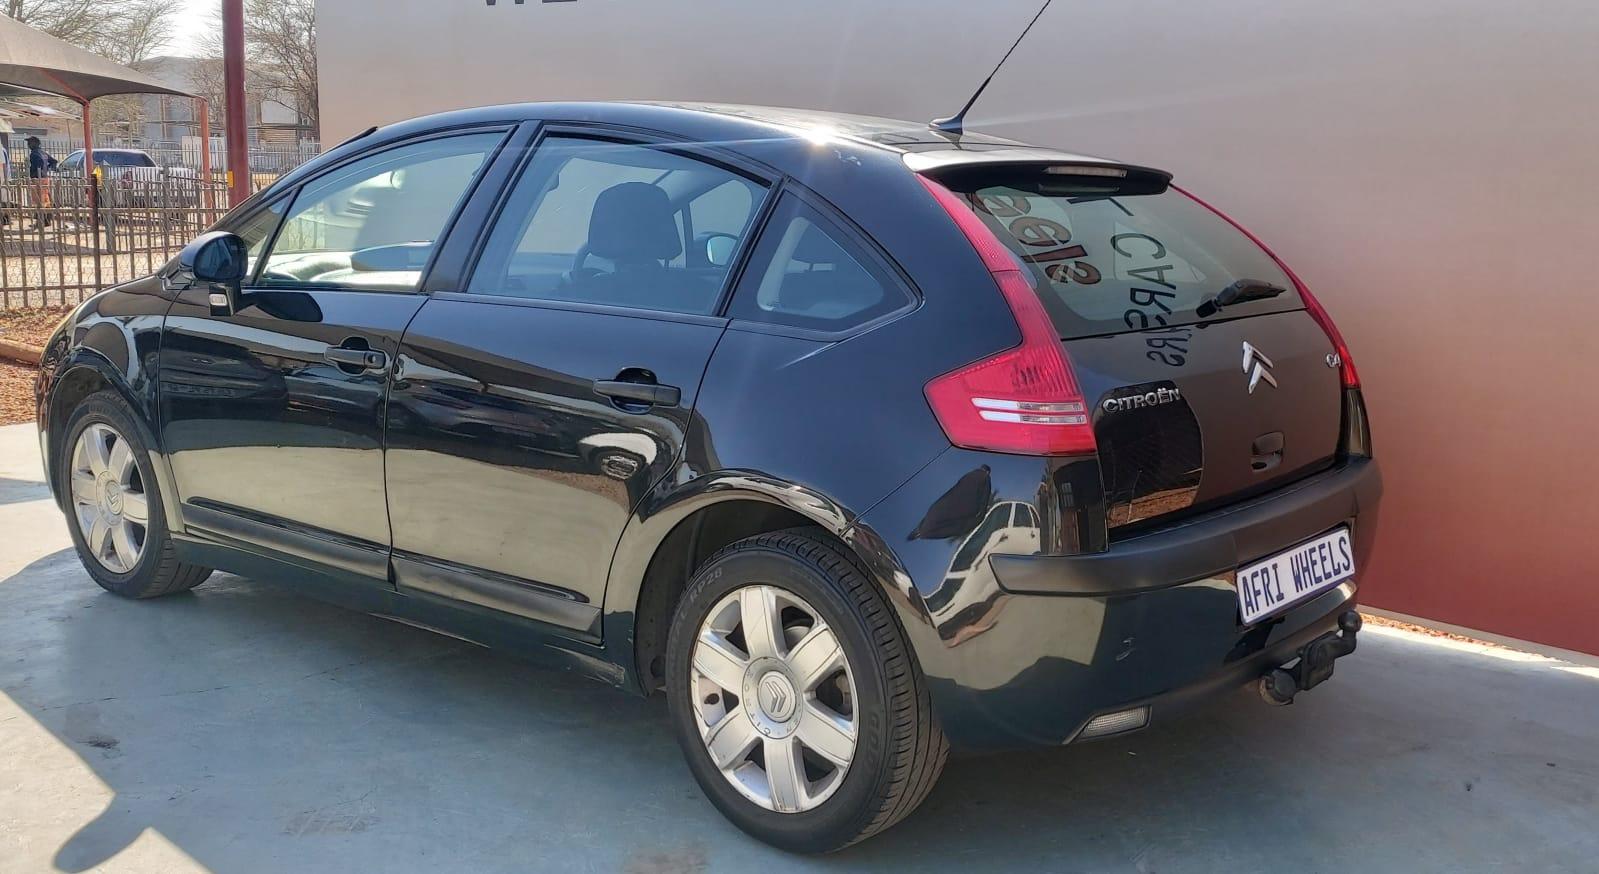 2005 Citroen C4 1.6